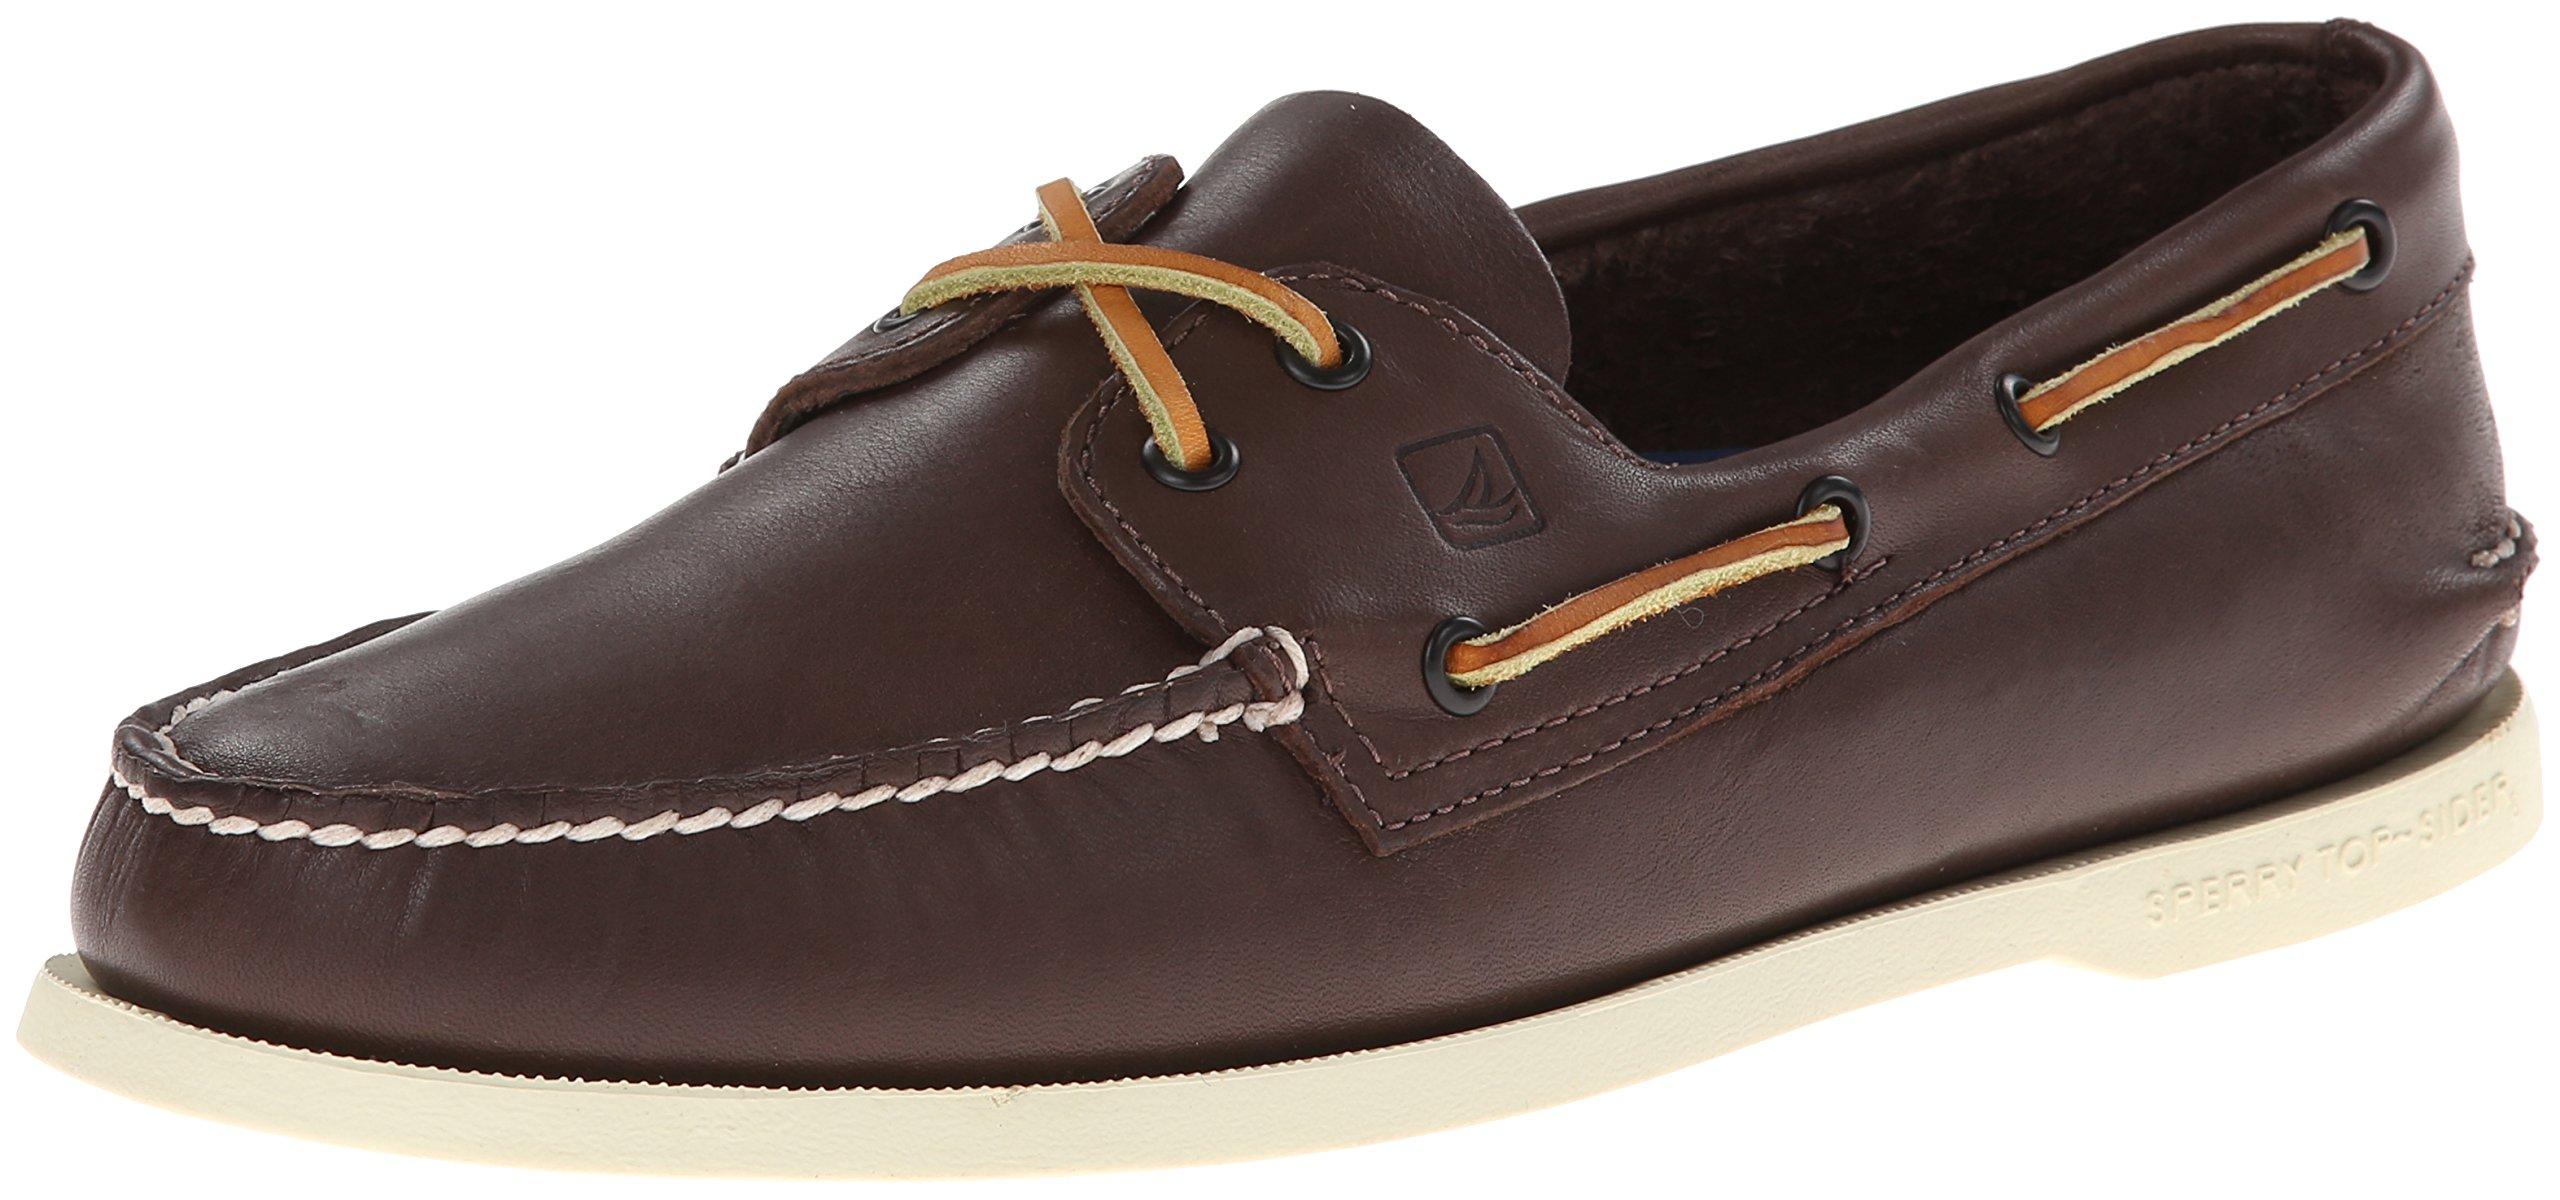 Sperry Top-Sider Men's Authentic Original, Classic Brown, 11.5 S (C)